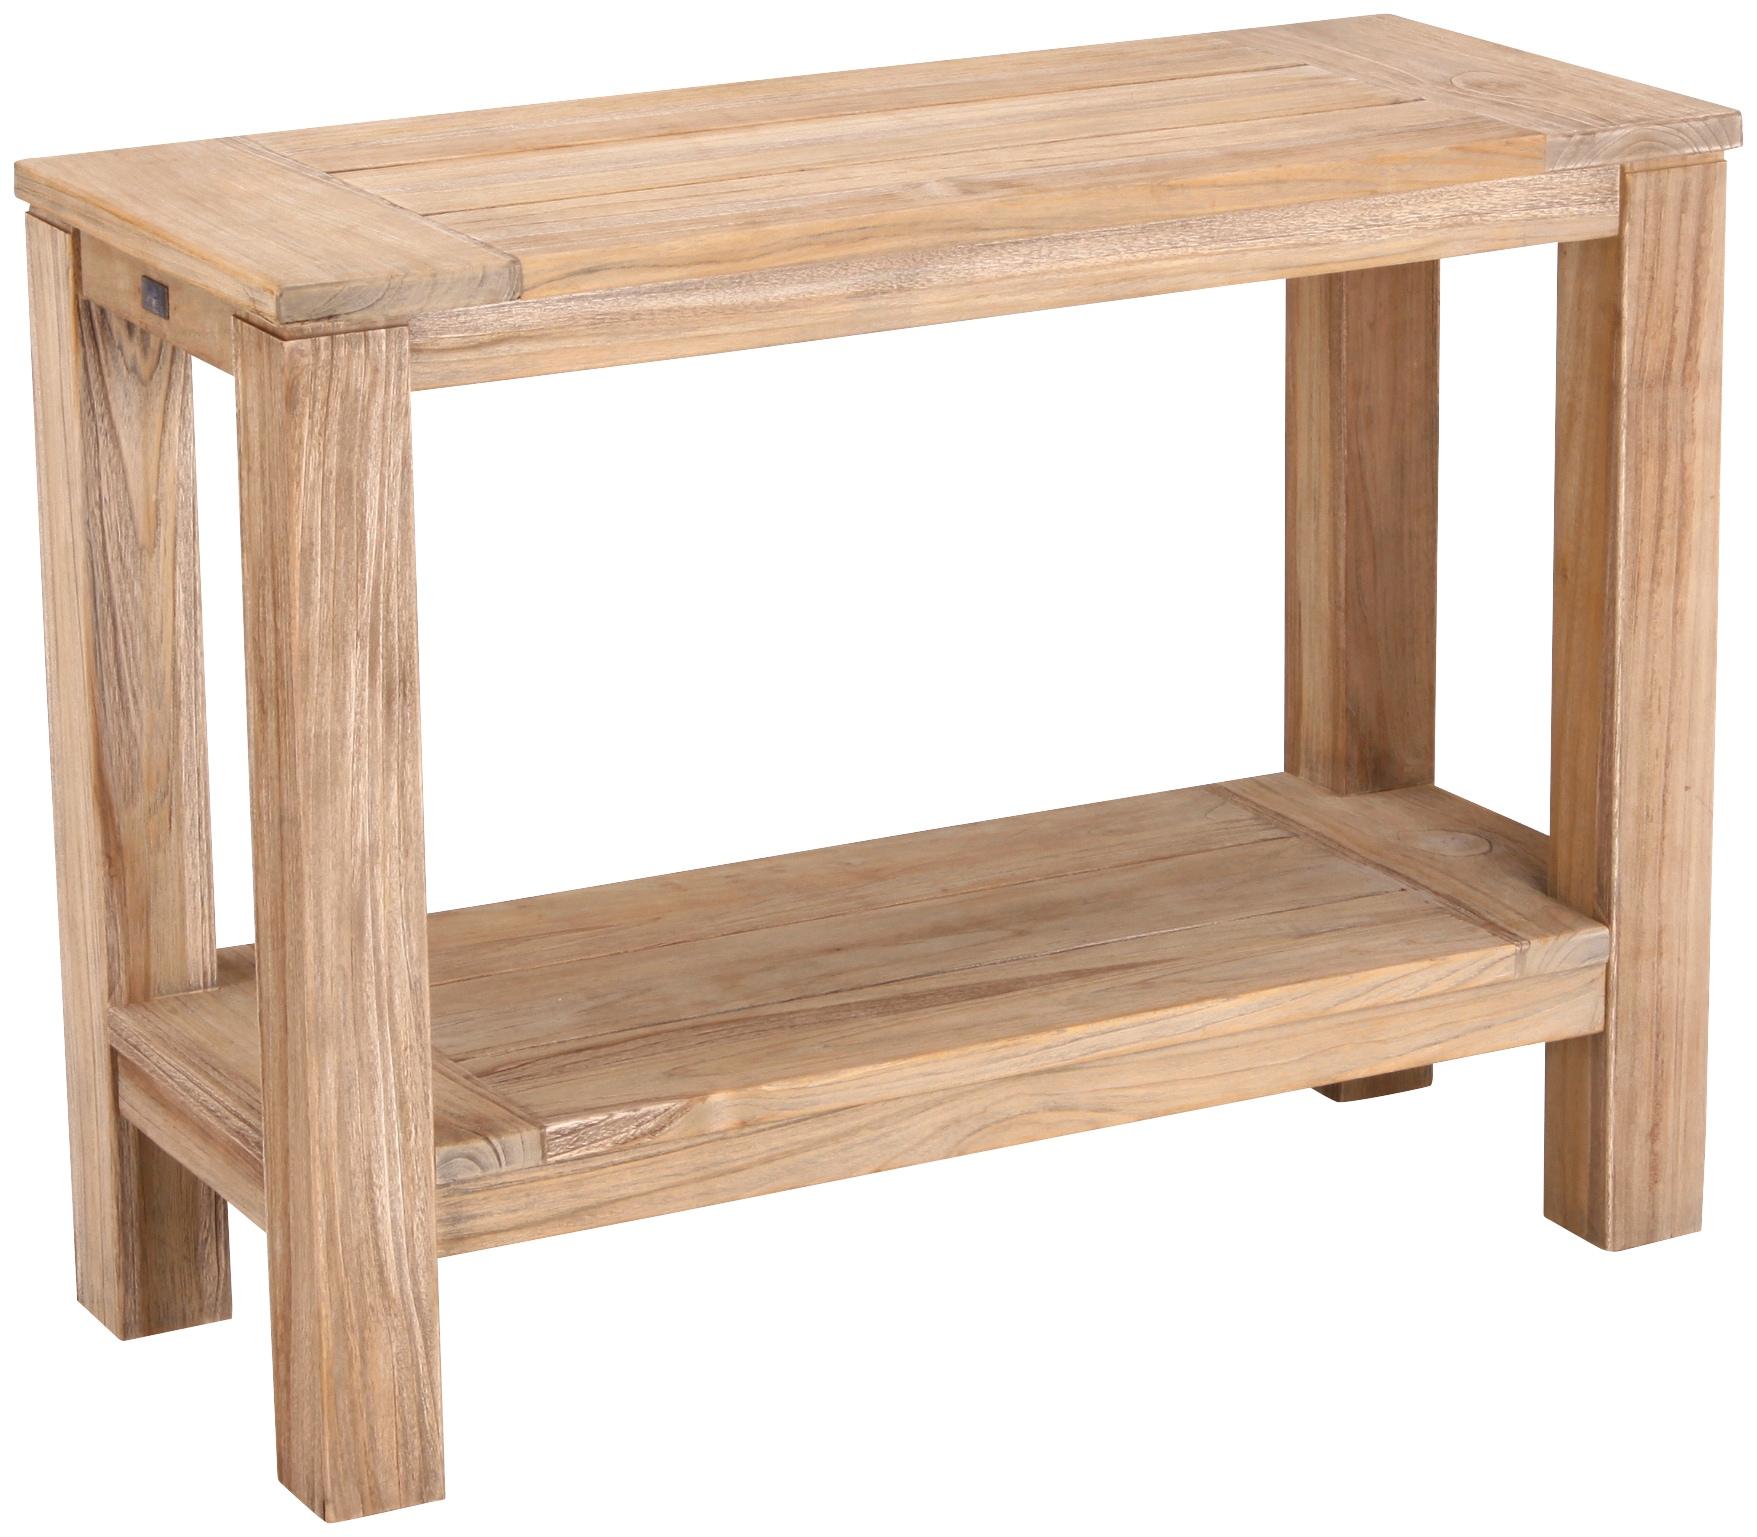 BEST Sideboard Moretti Teakholz 100x75x42 cm braun